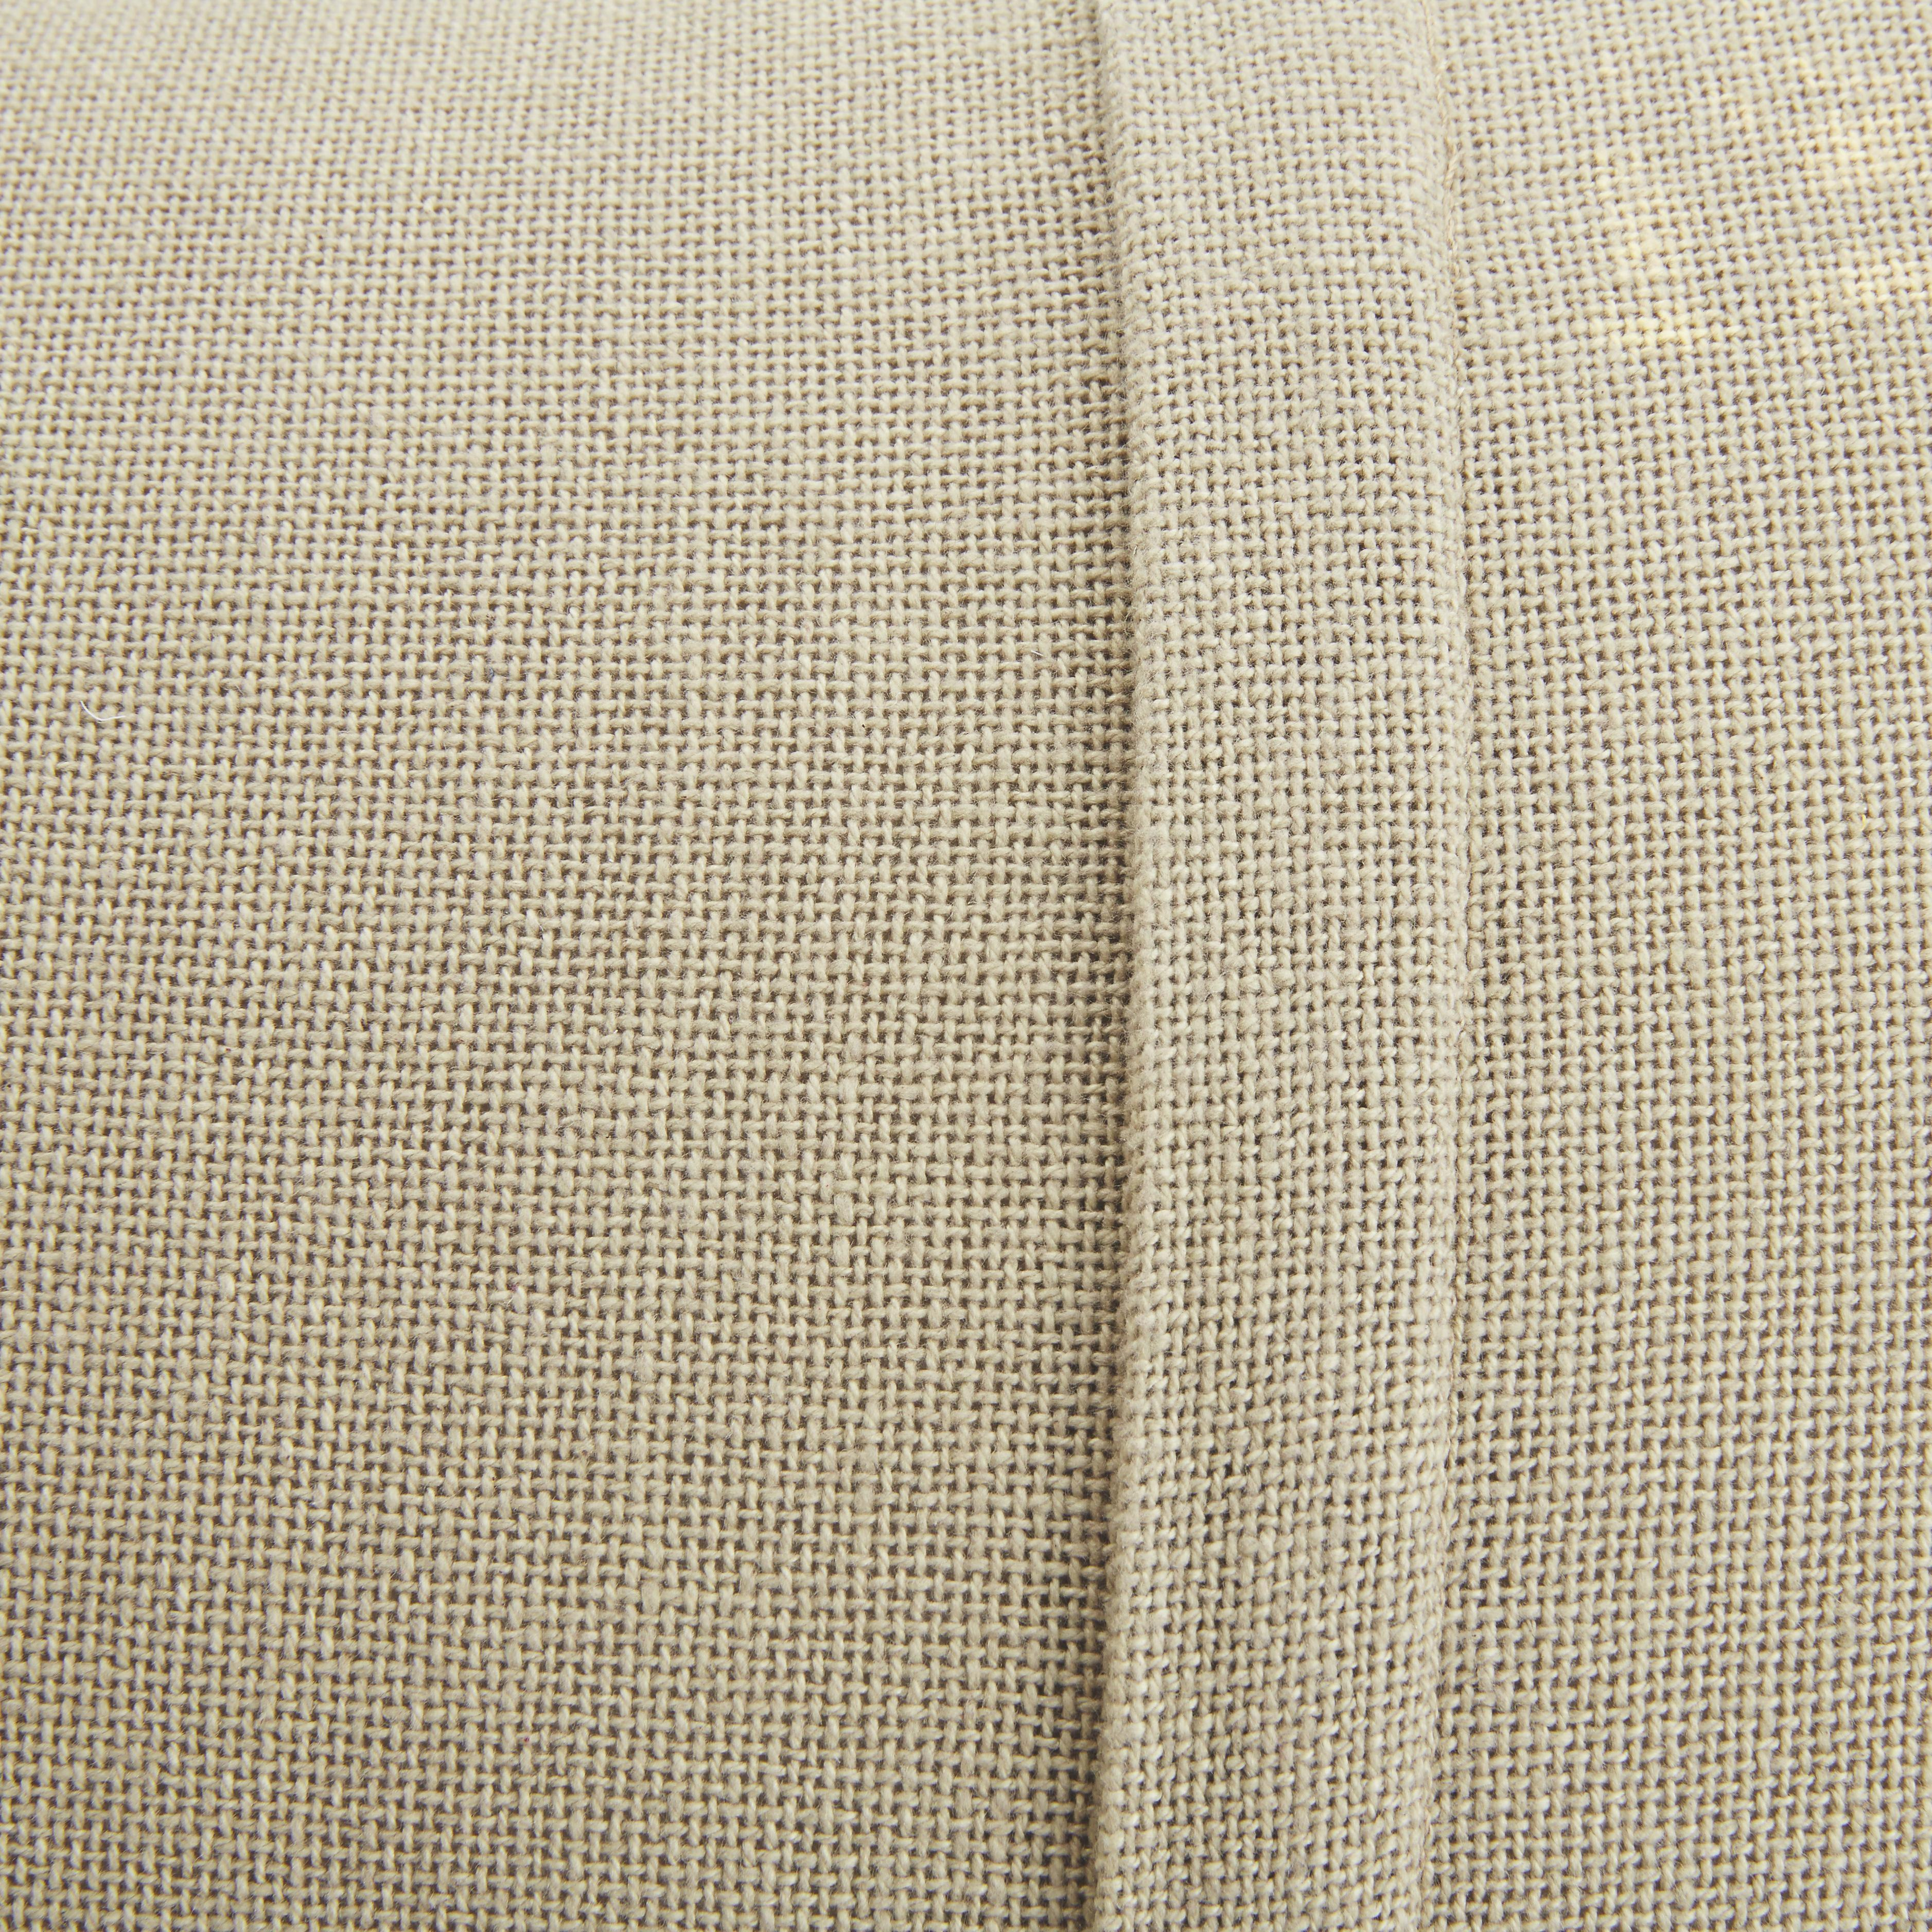 Zierkissen William 40x60cm - Multicolor, Textil (40/60cm) - MÖMAX modern living